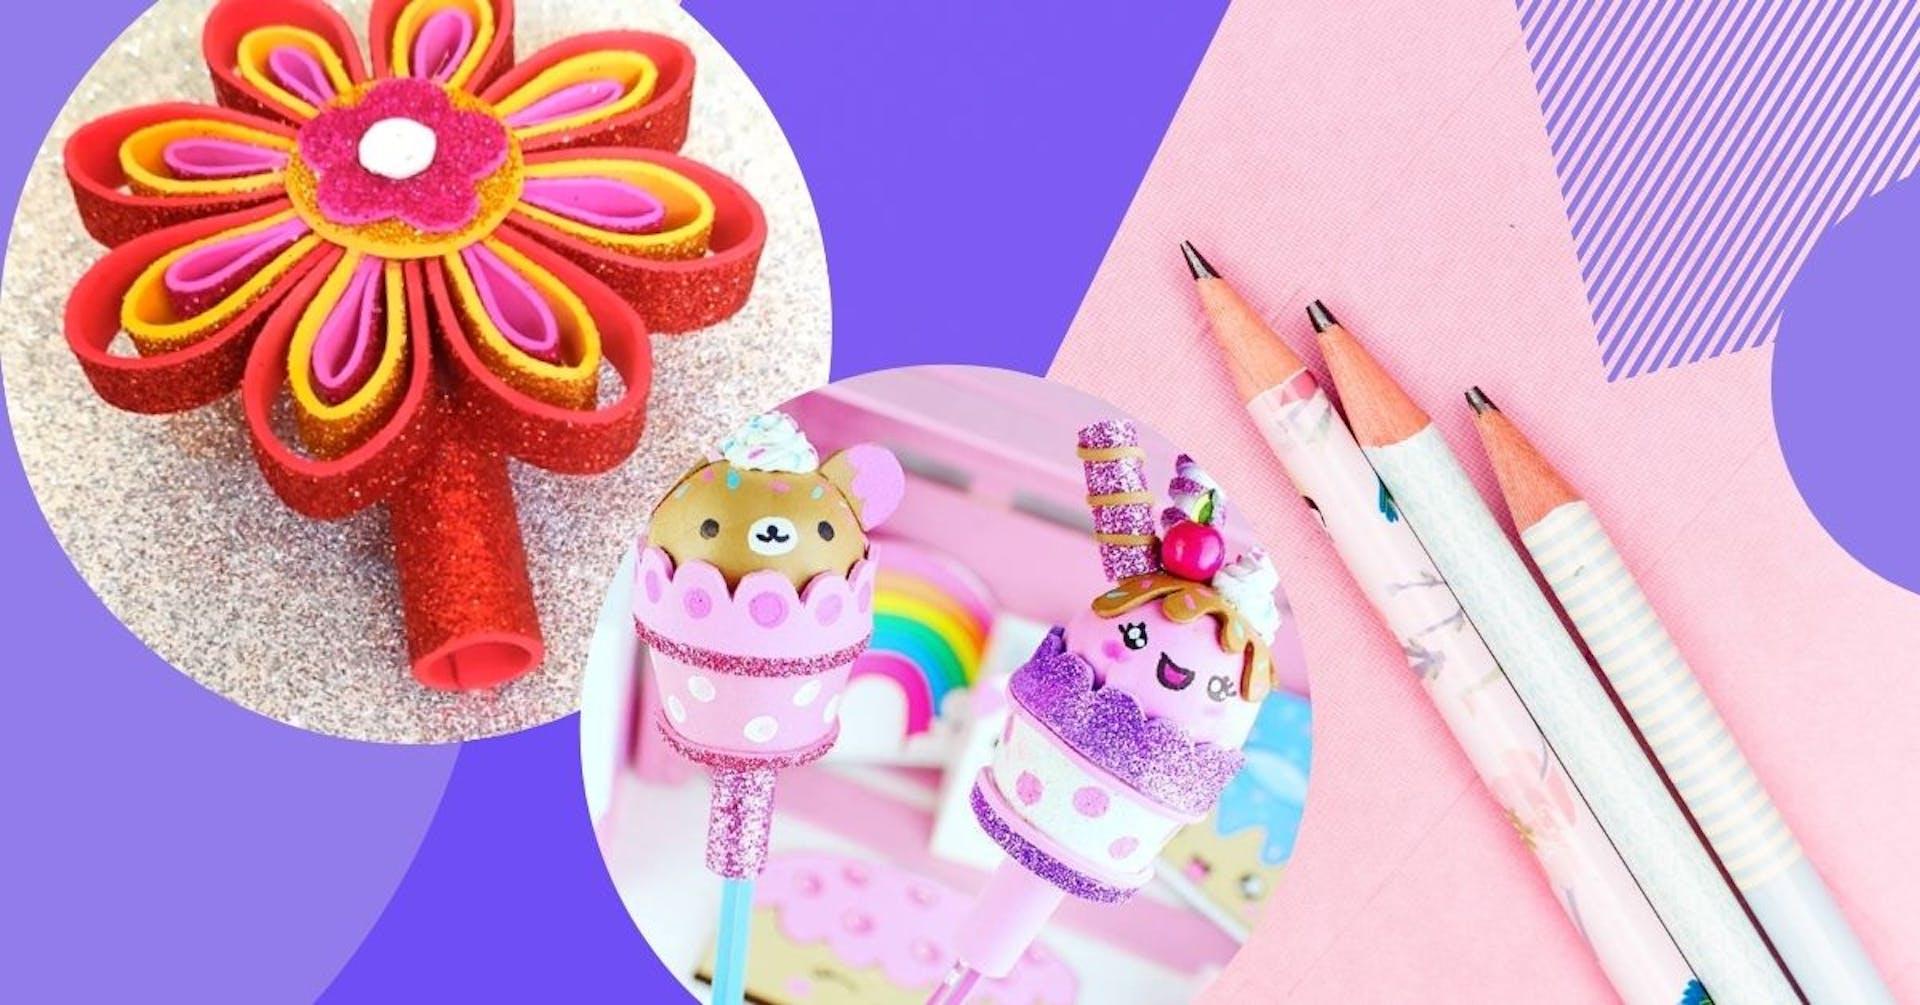 ¿Cómo decorar lápices para vender?: 6 creativas ideas para emprender con éxito este 2021